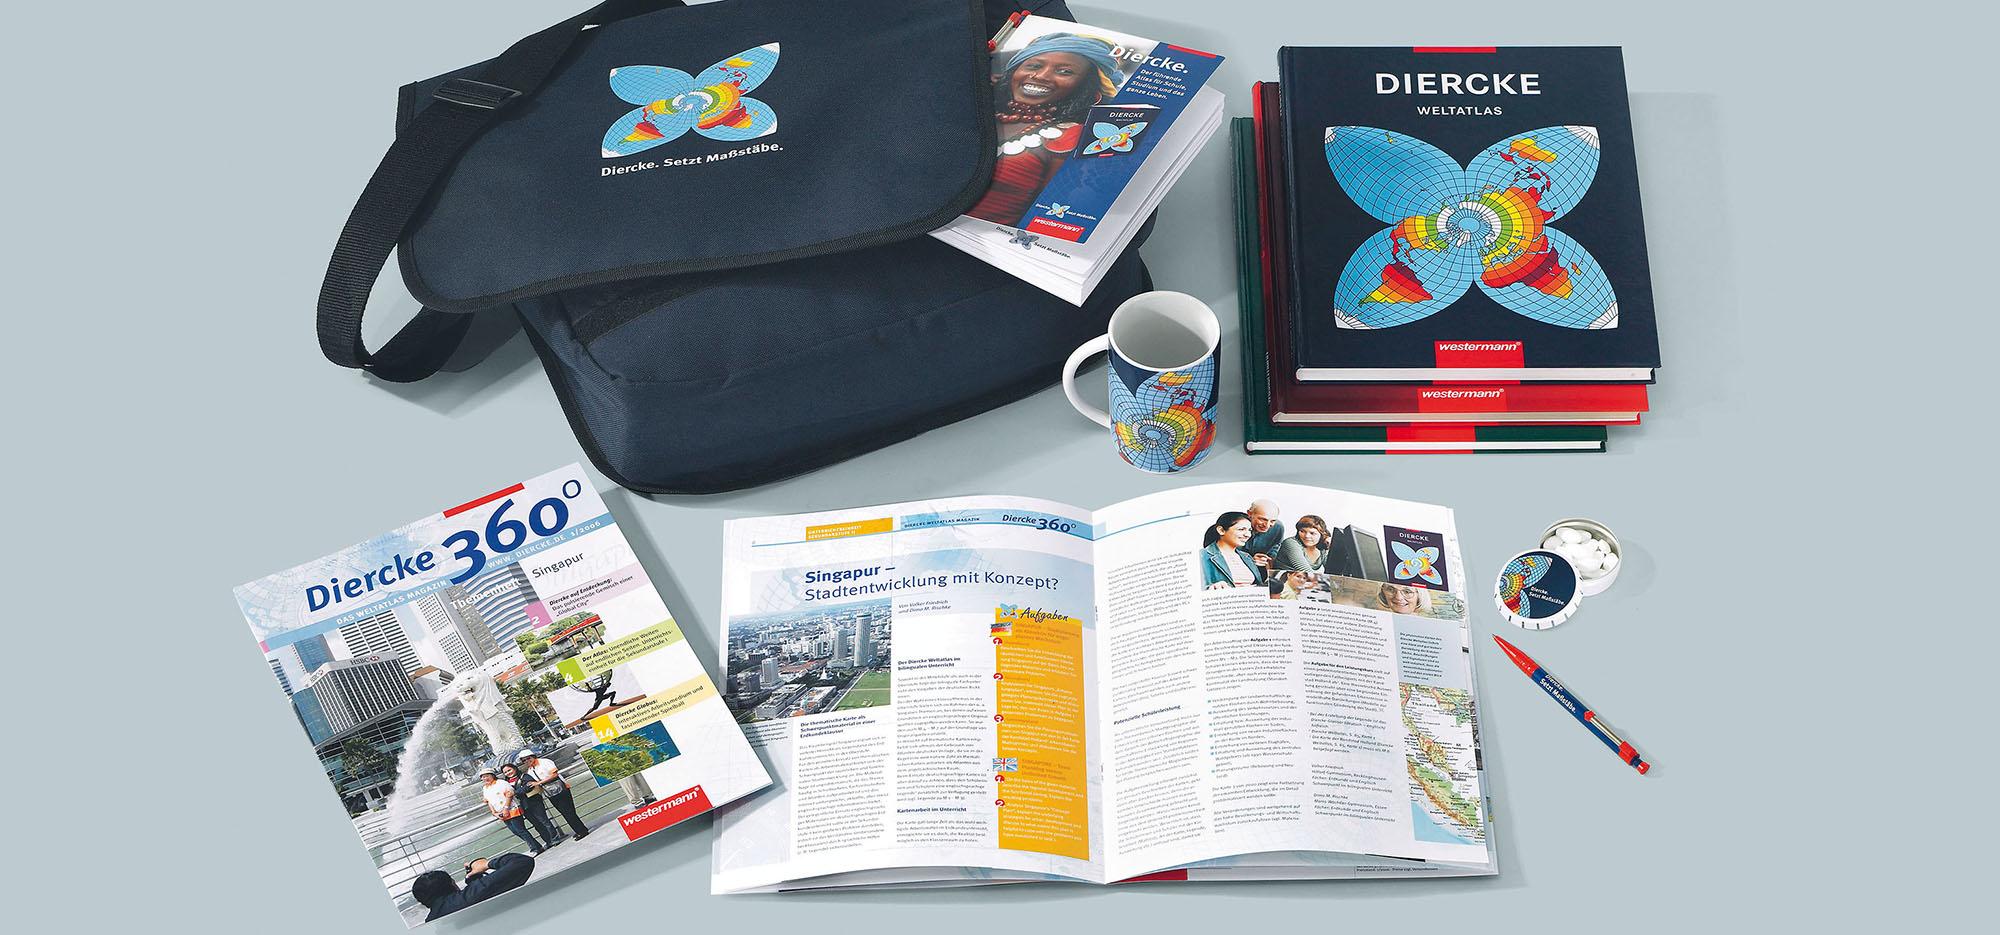 Westermann Corporate Publishings Diercke – Werbeagentur Lehnstein Koblenz Referenzen